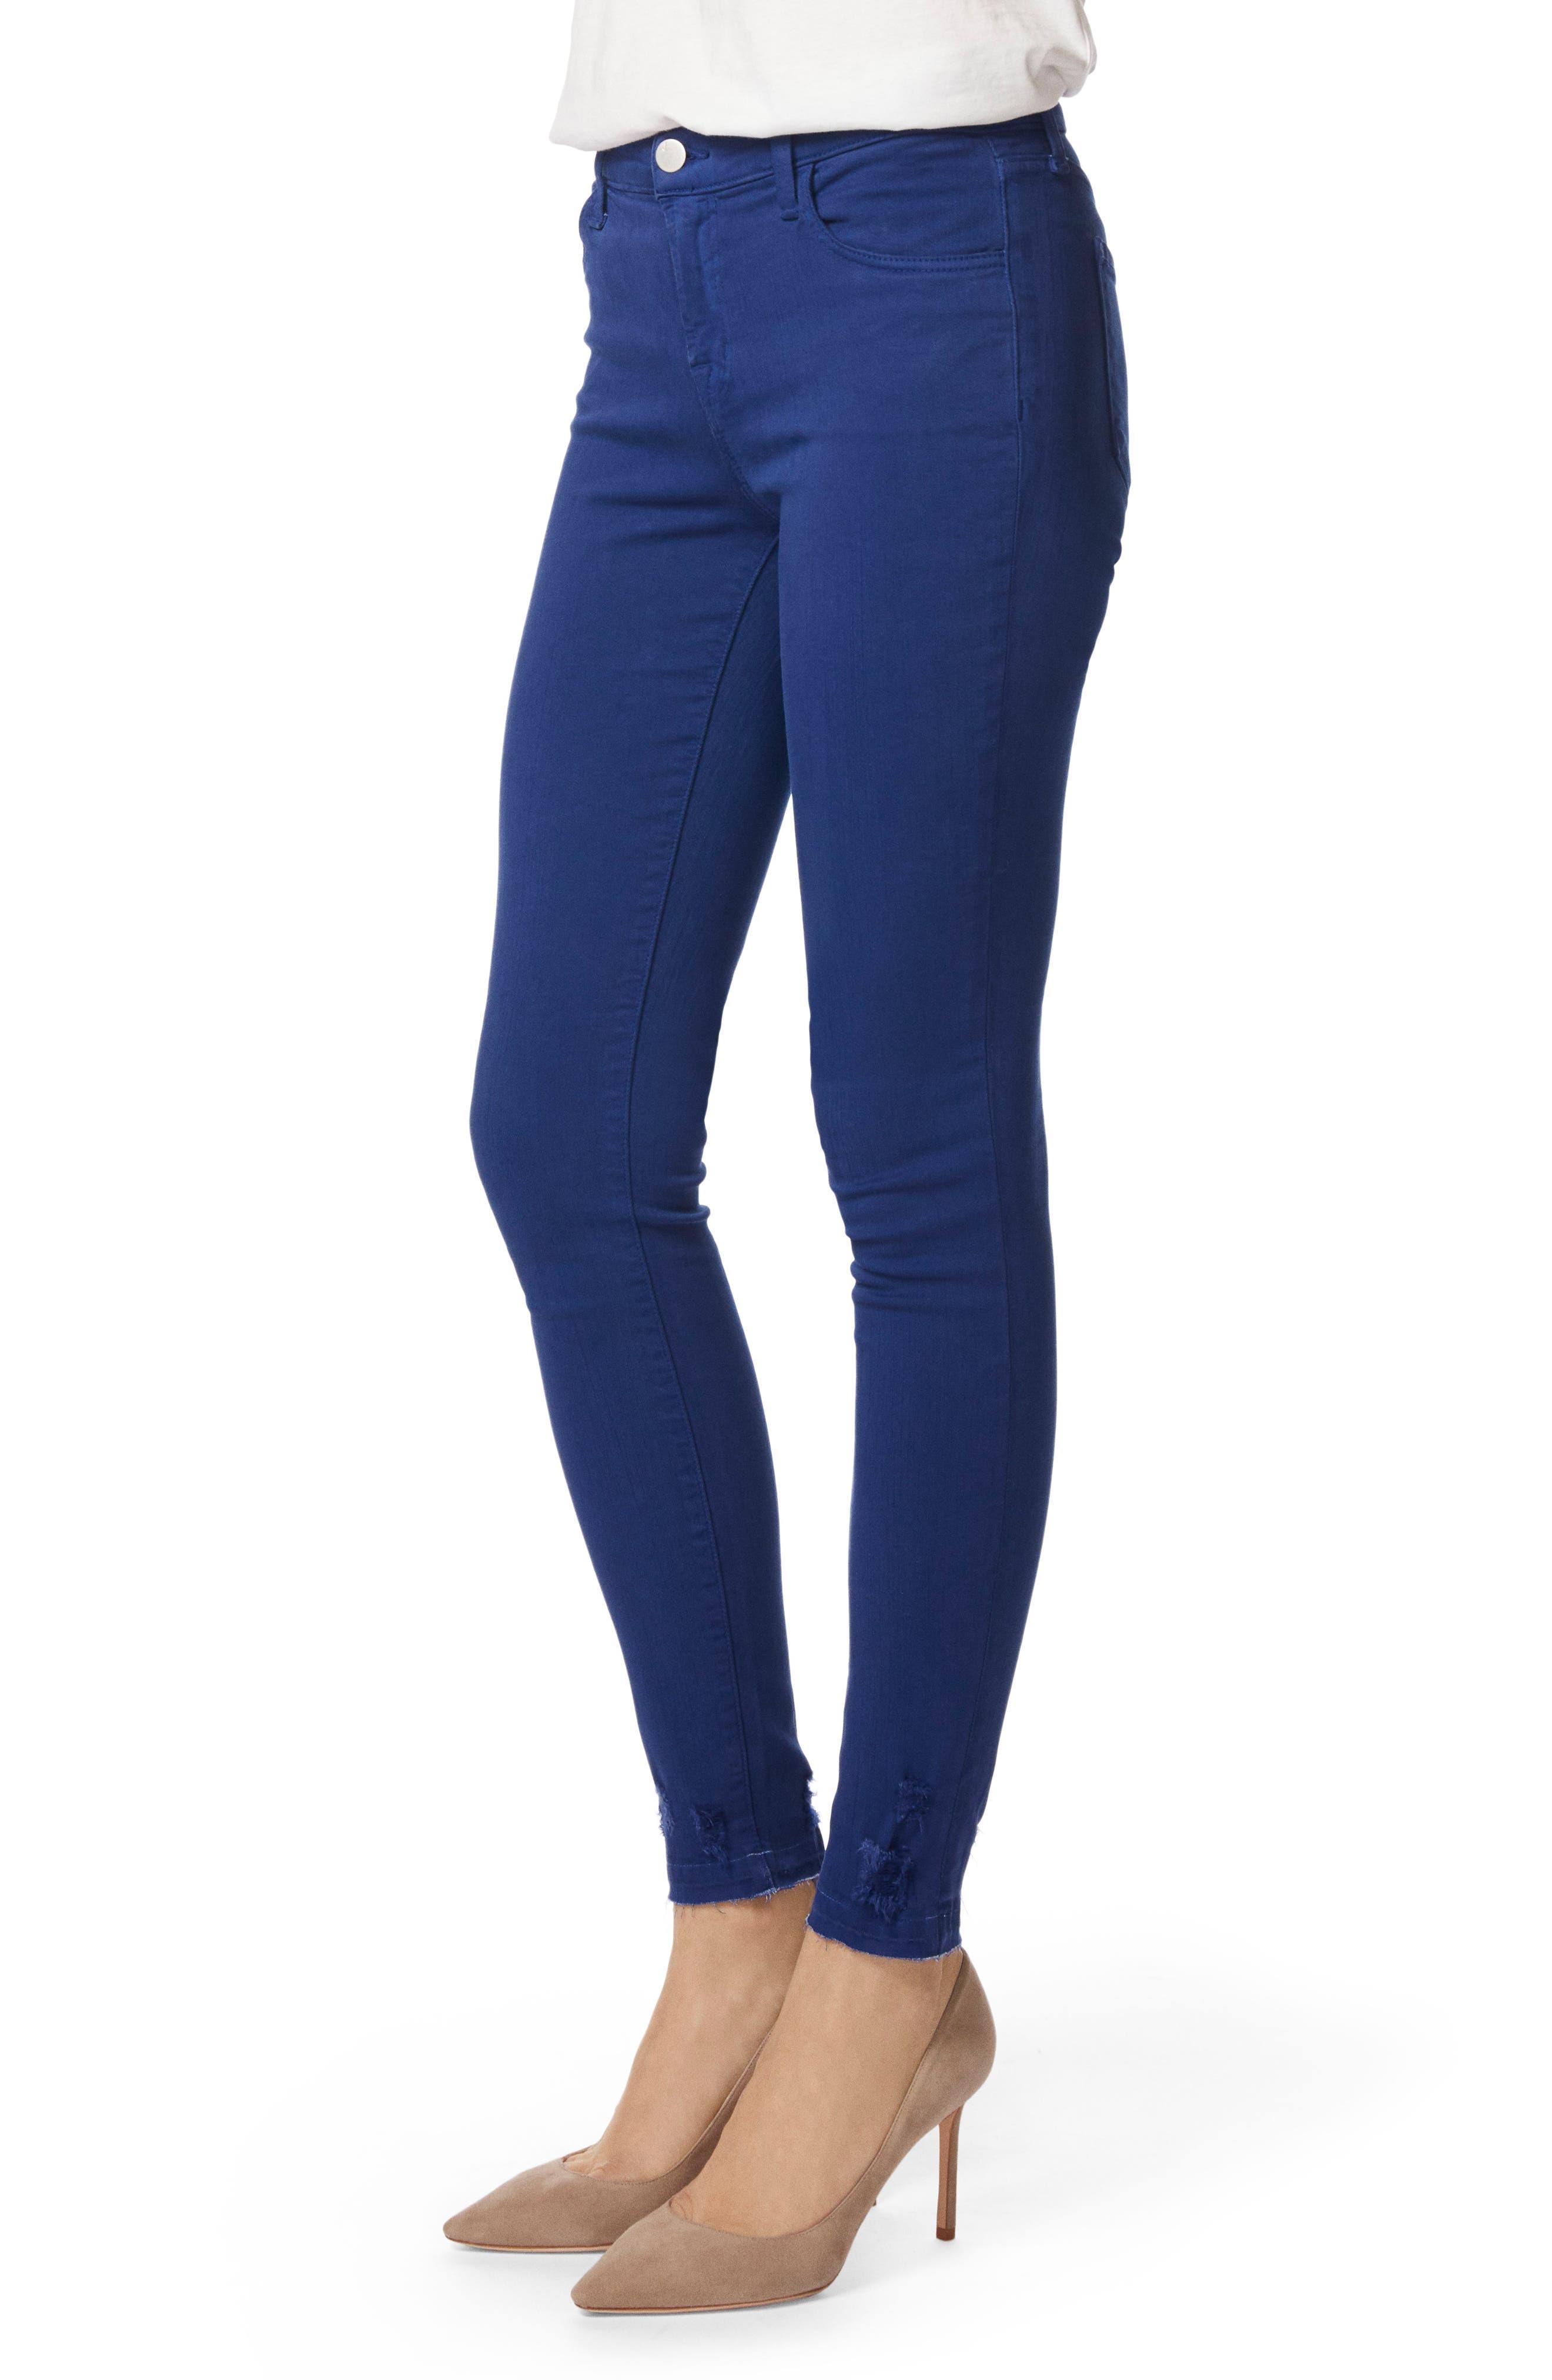 620 Mid Rise Super Skinny Jeans,                             Alternate thumbnail 3, color,                             Electric Sea Destruct